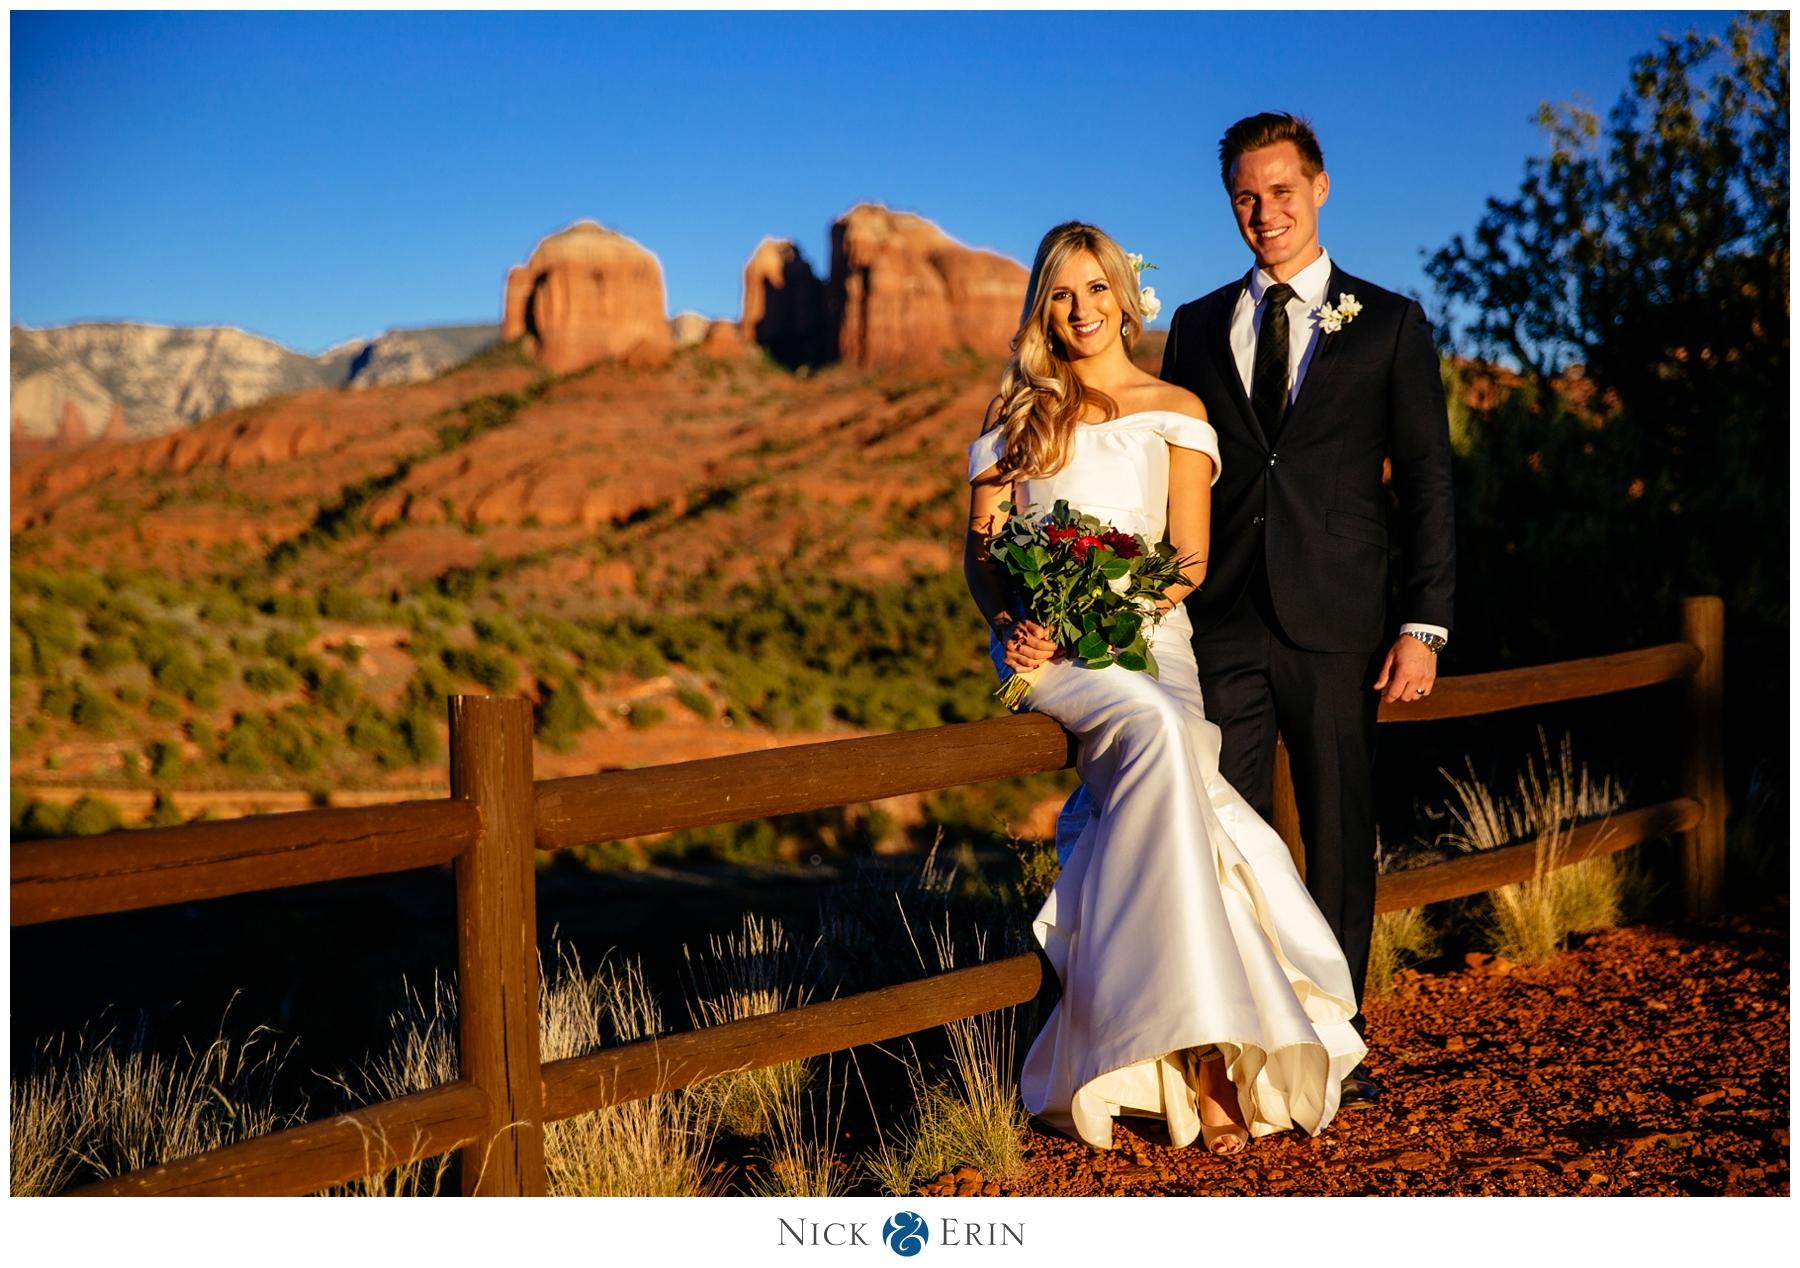 Donner_Photography_Sedona Arizona Wedding_Alissa and Tom_0004